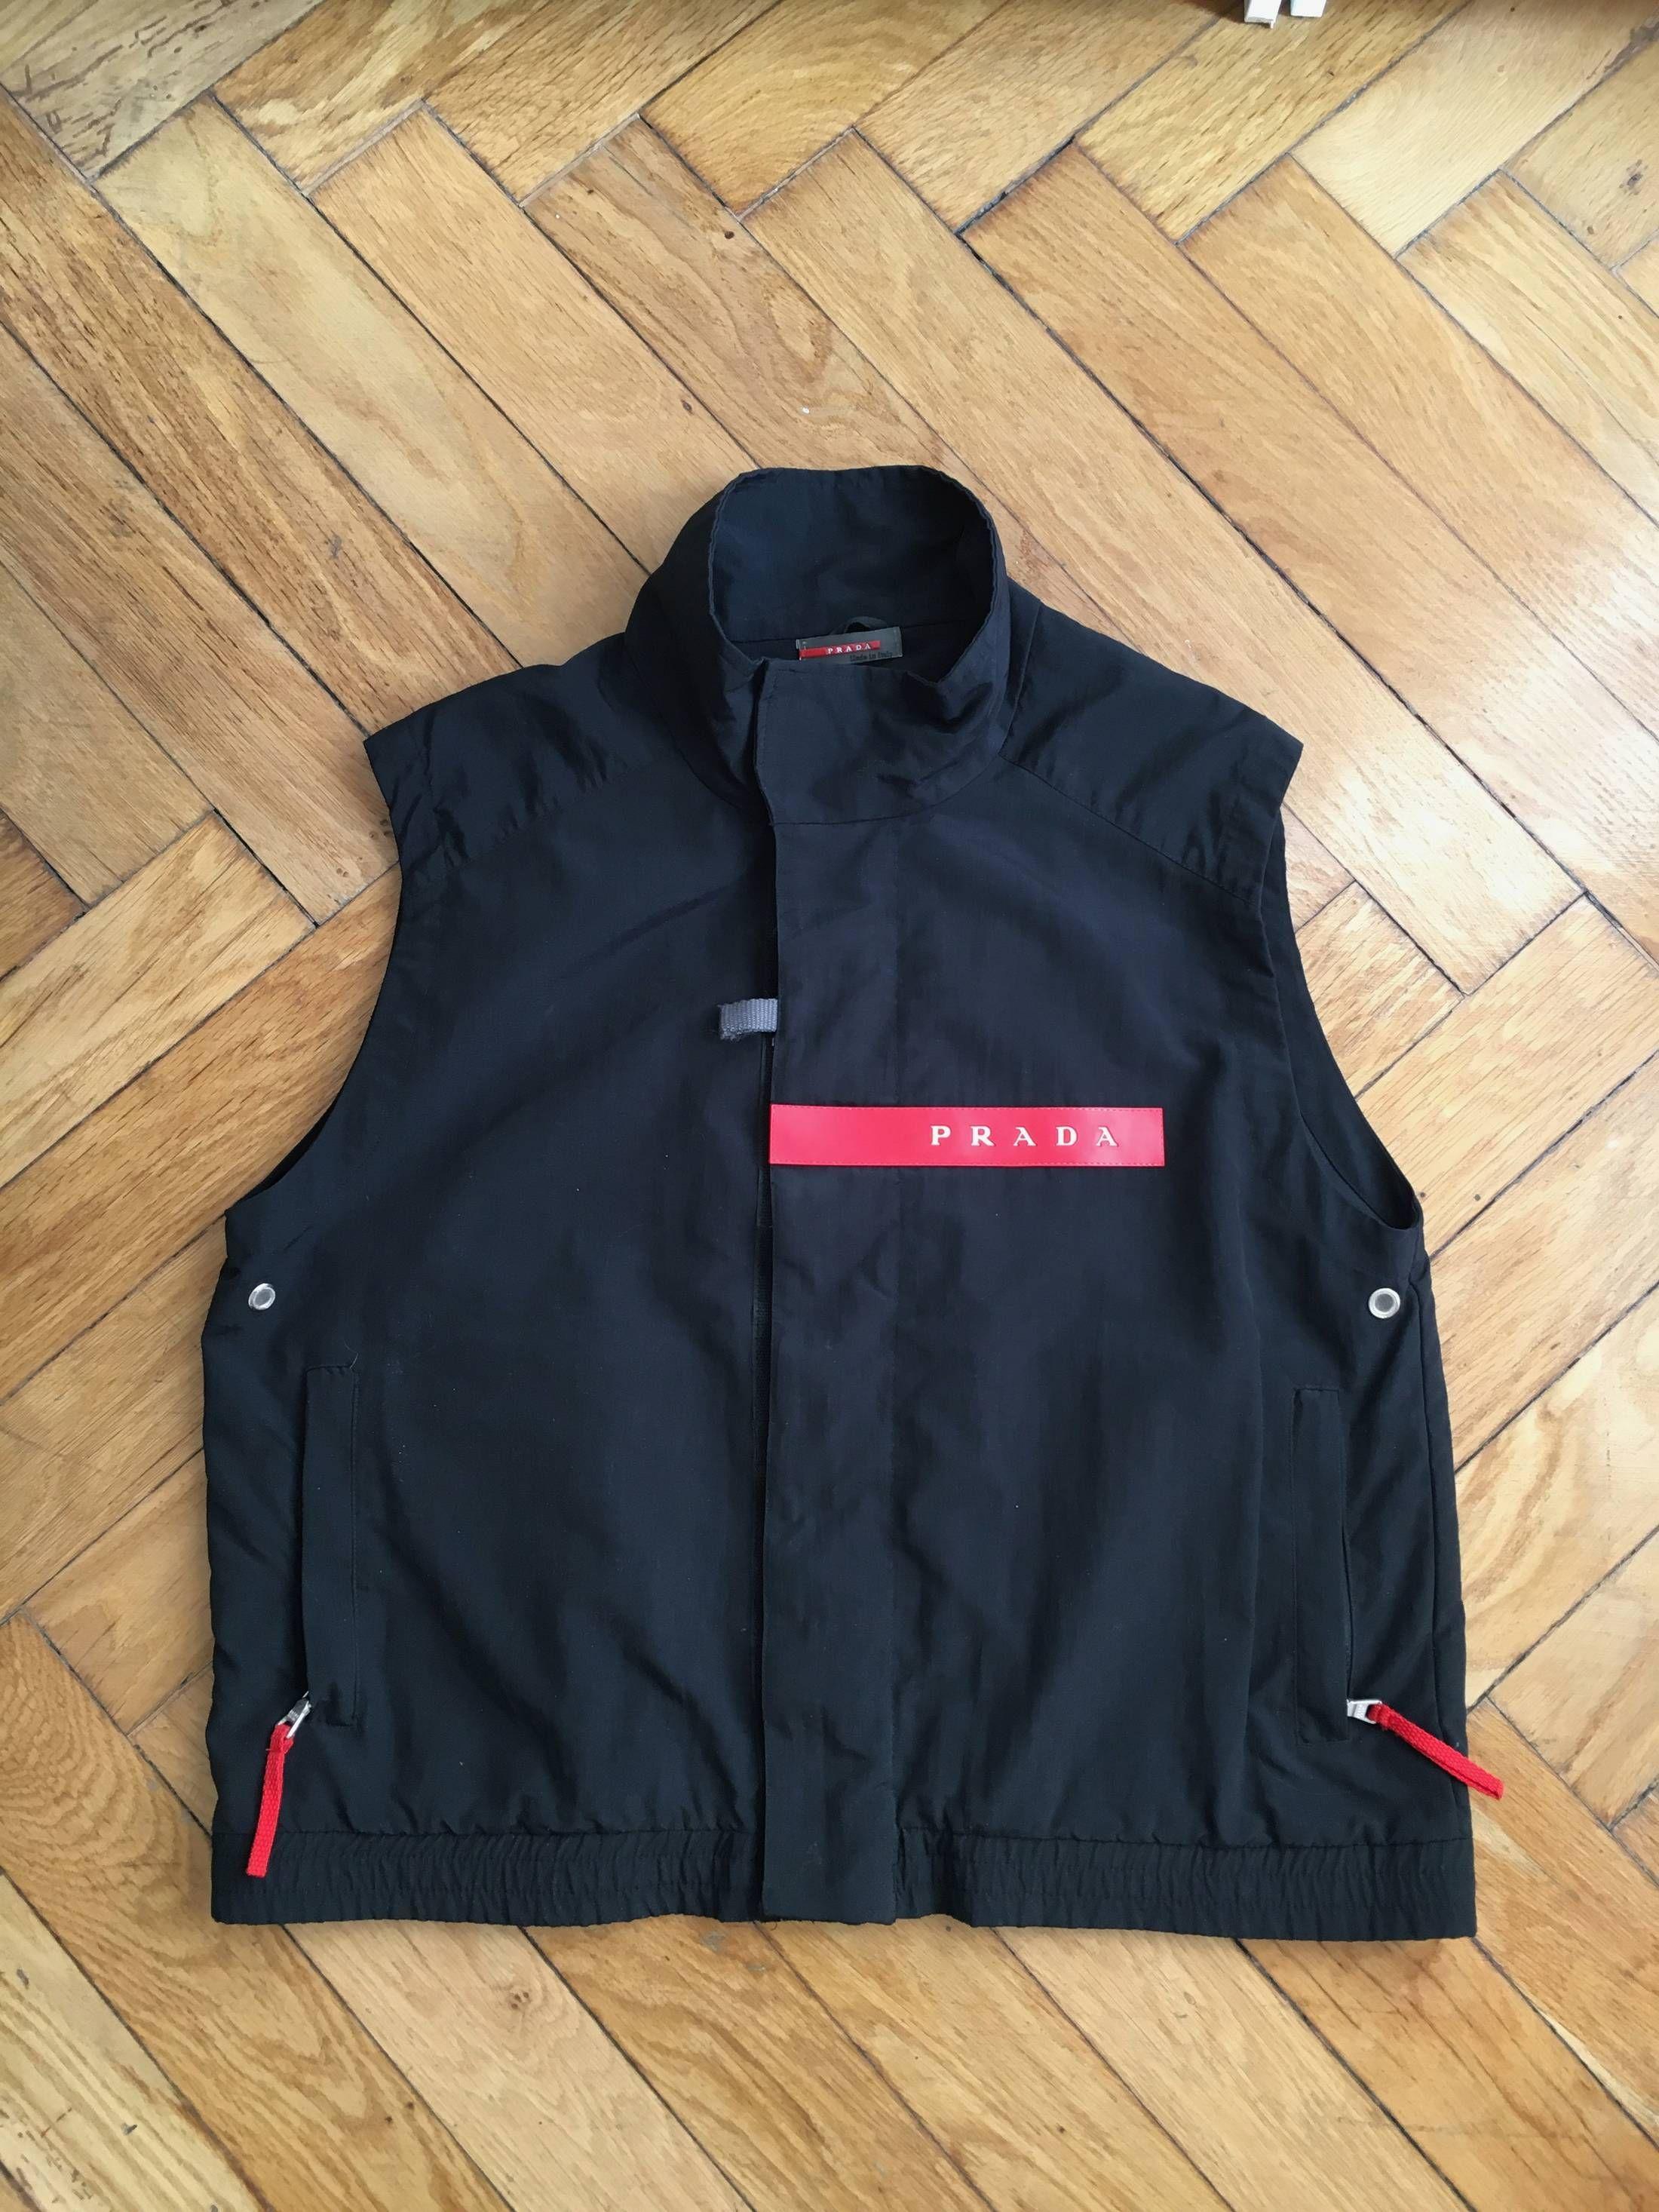 6996610c9167 Prada Rare Prada 90s Nylon Vest Size US S   EU 44-46   1